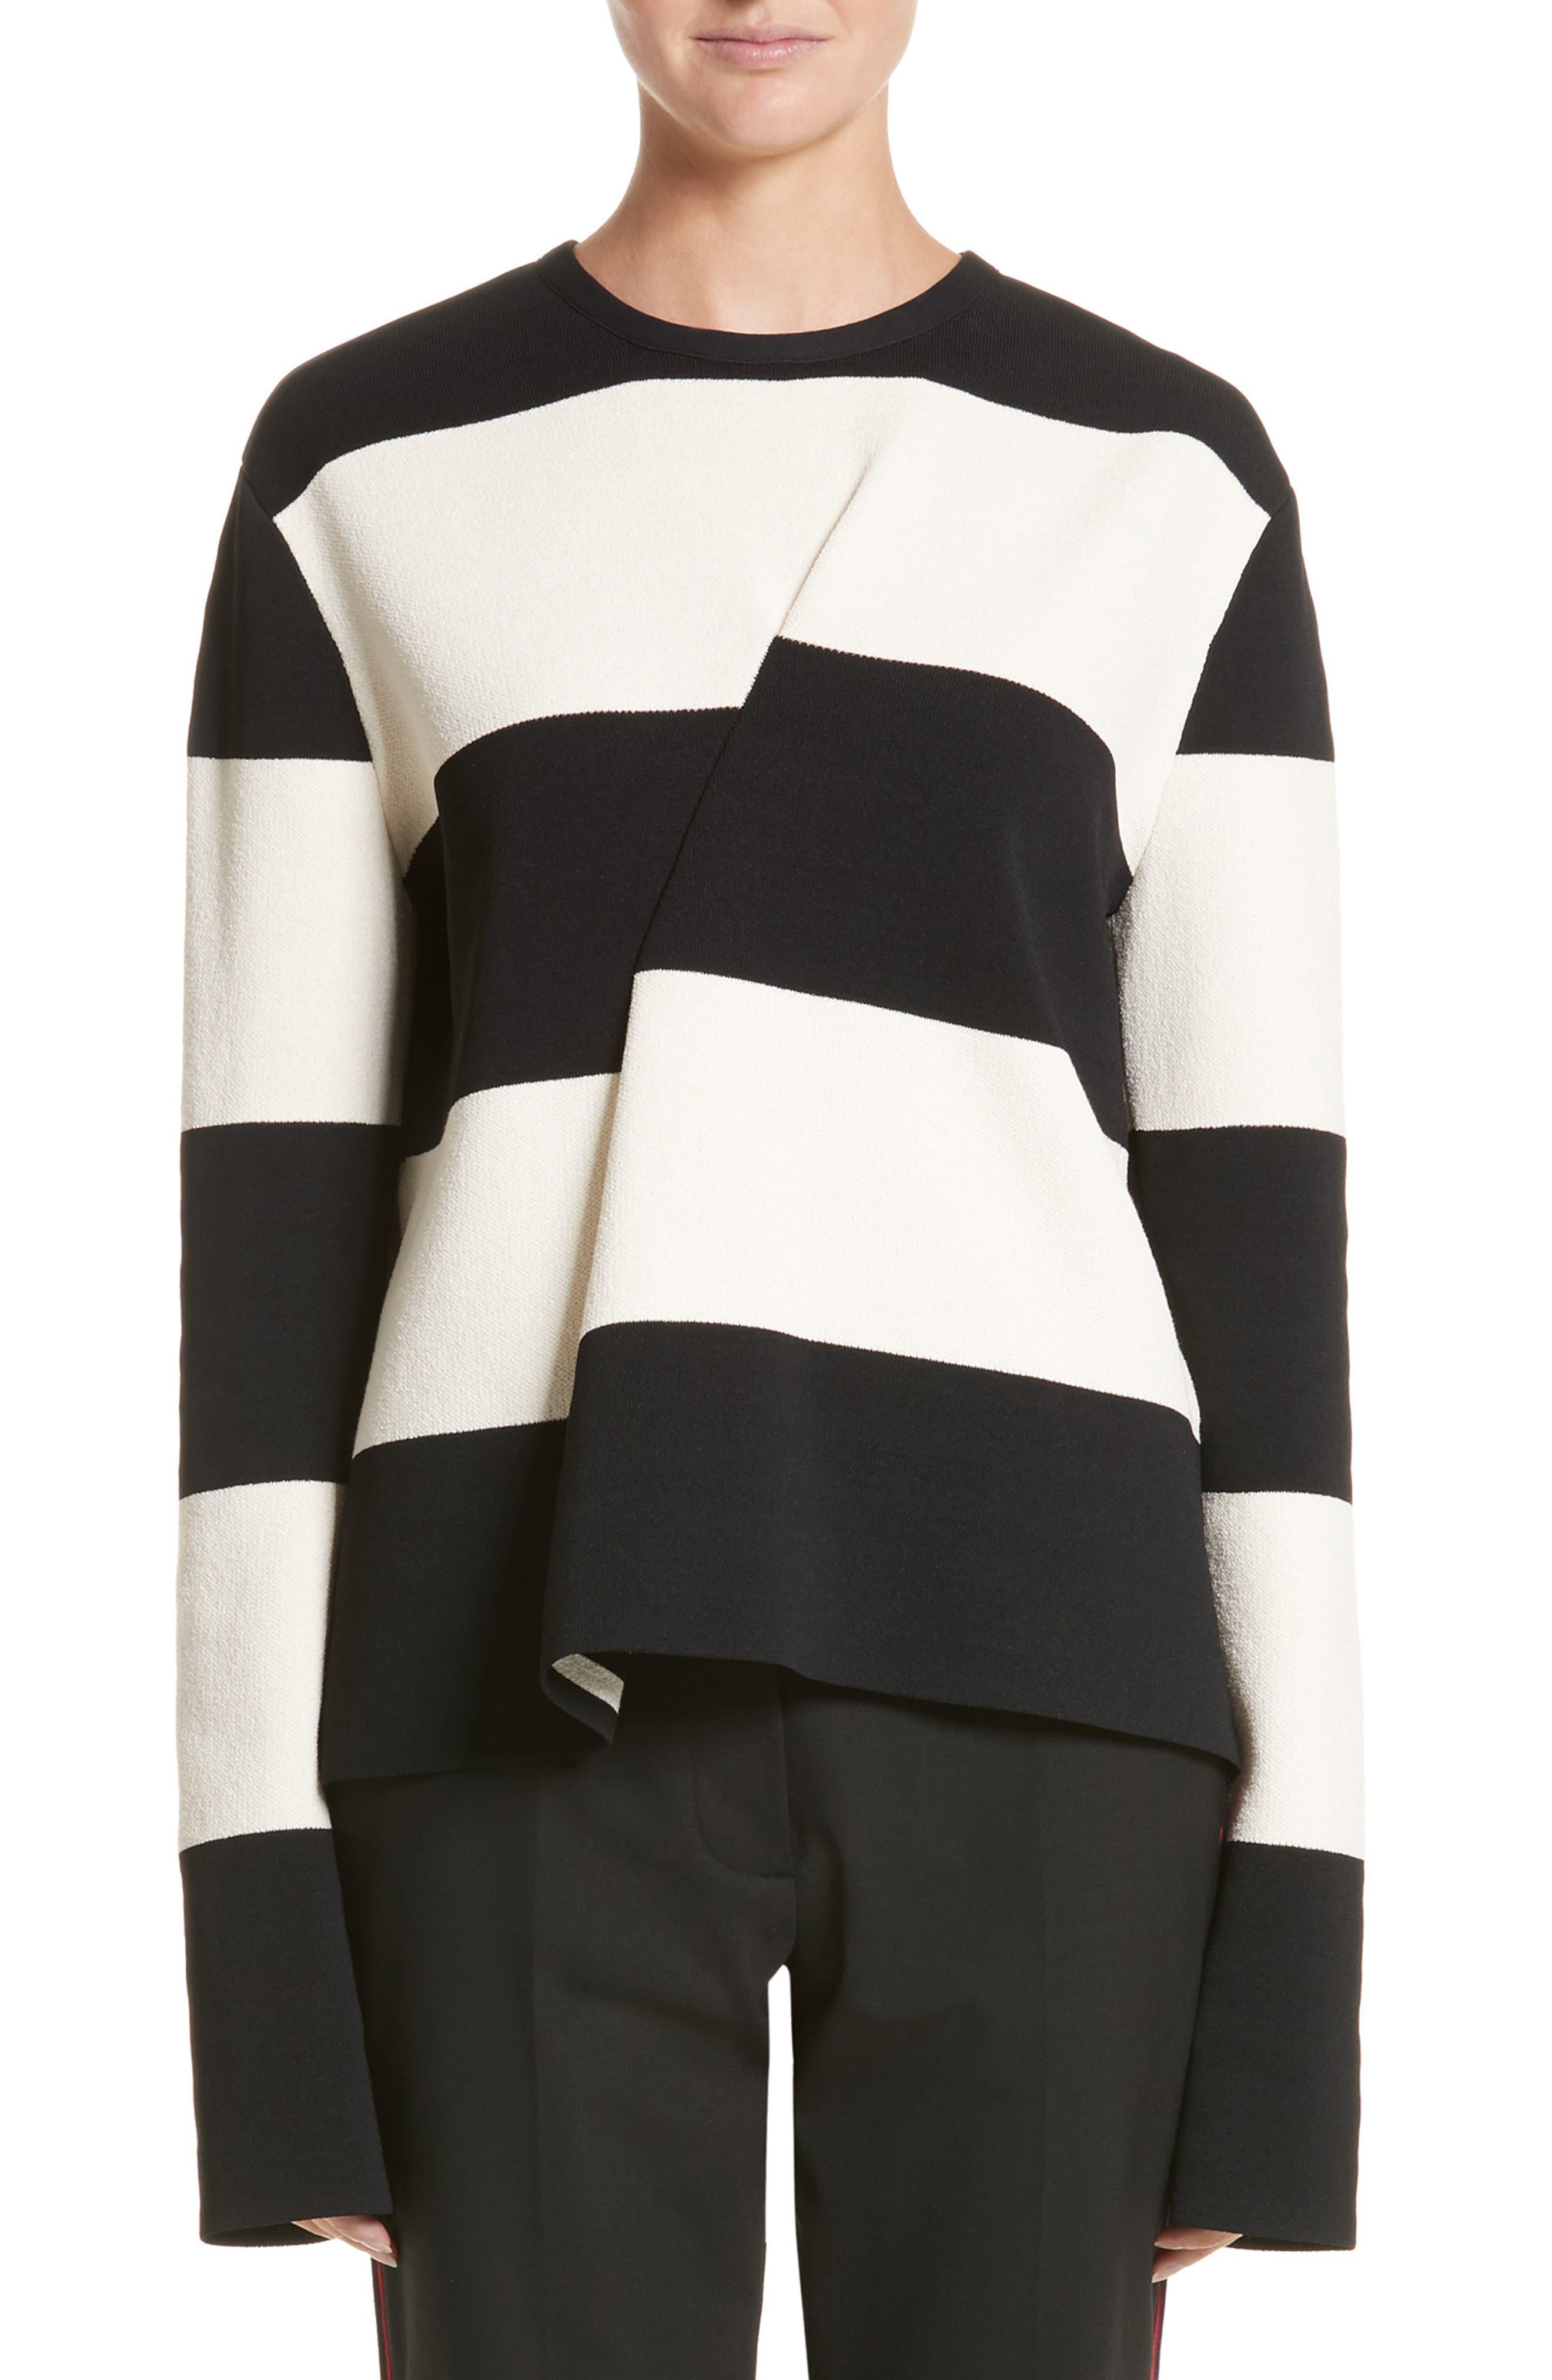 Alternate Image 1 Selected - CALVIN KLEIN 205W39NYC Folded Stripe Sweater